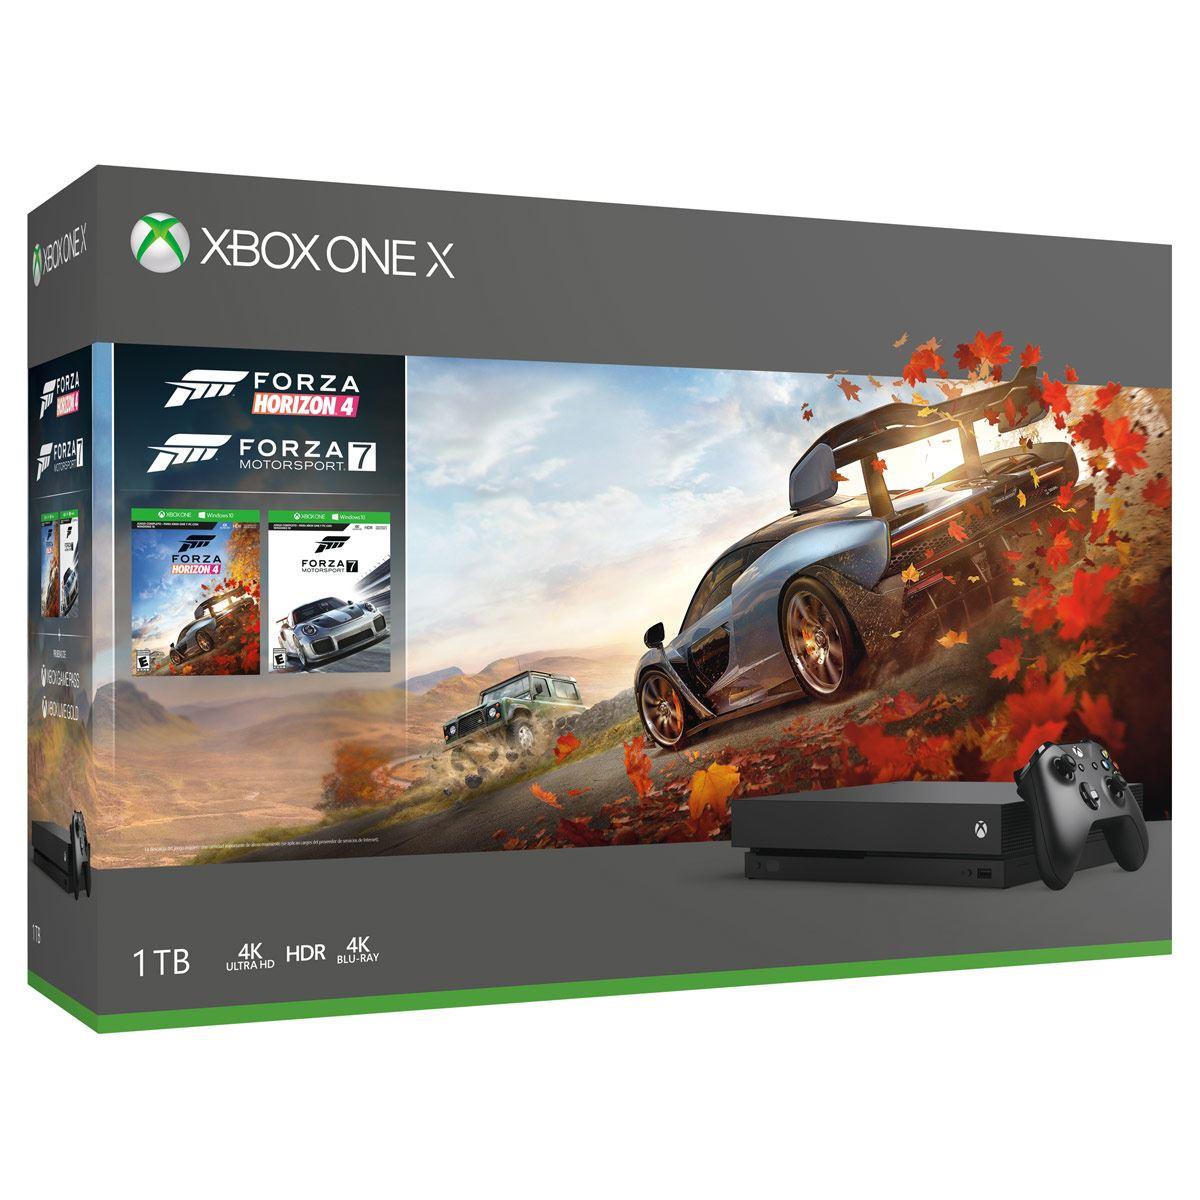 Xbox One X de 1TB+ Forza Horizon 4+ Forza Motorsport 7